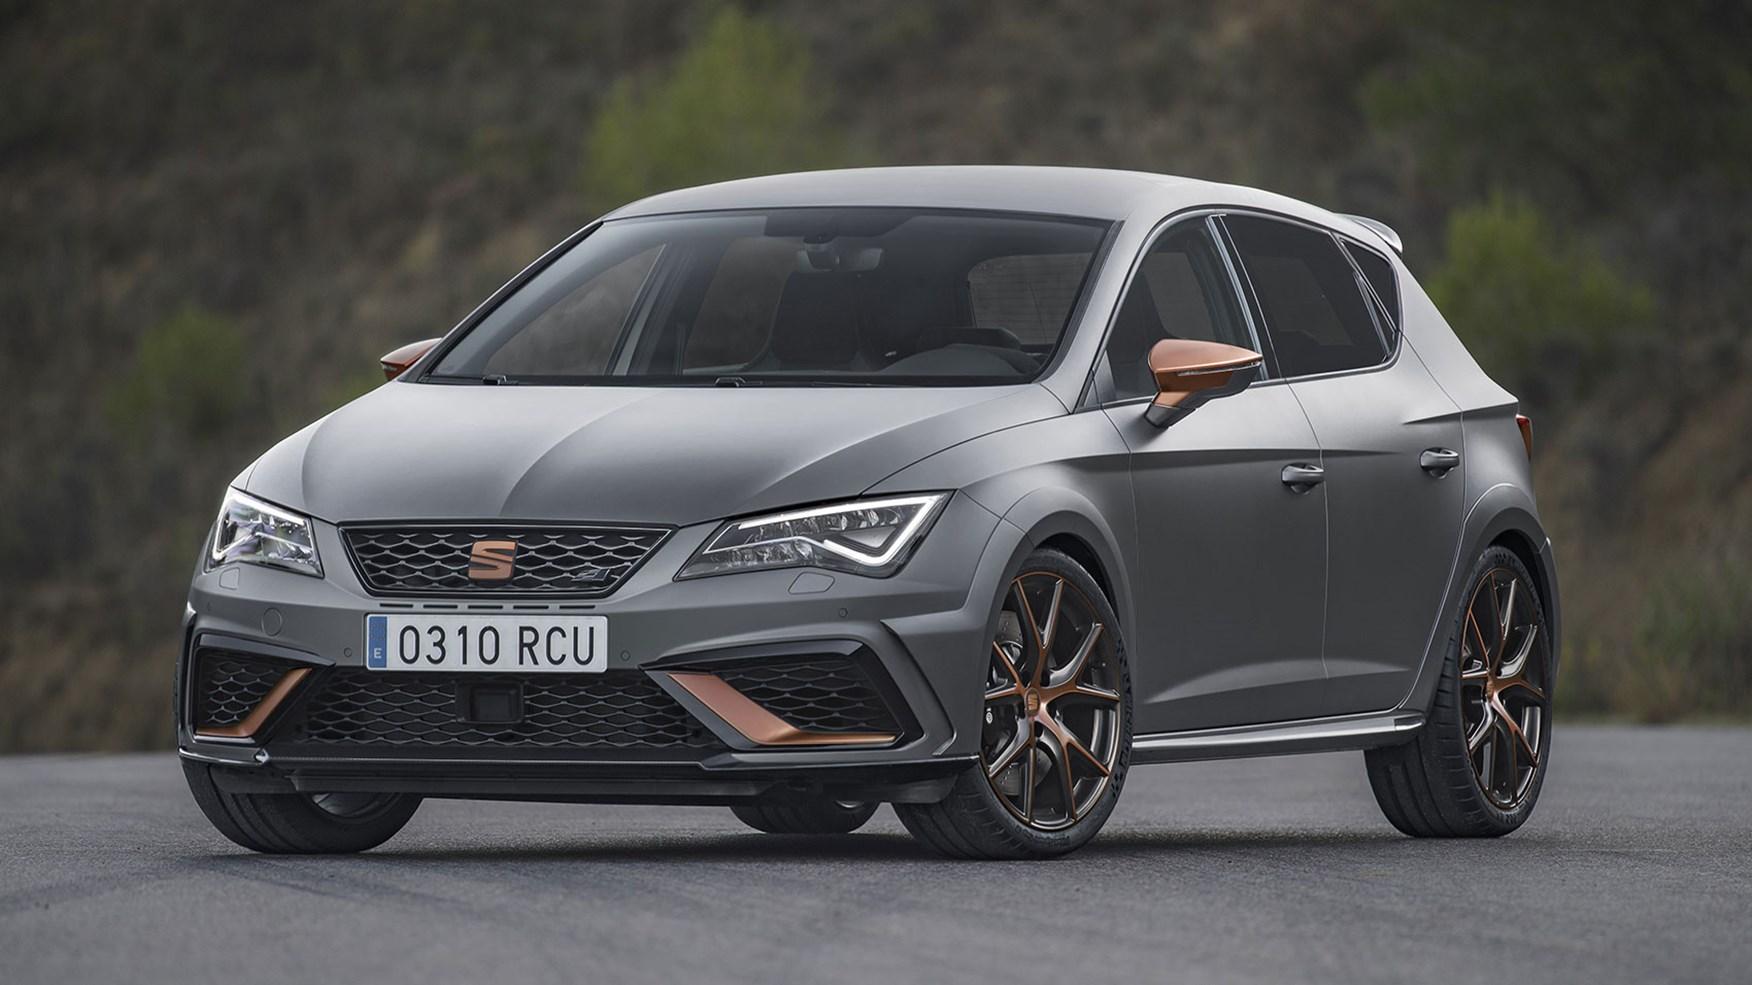 Golf Estate R Review >> Seat Leon Cupra R review: needs more spice | CAR Magazine